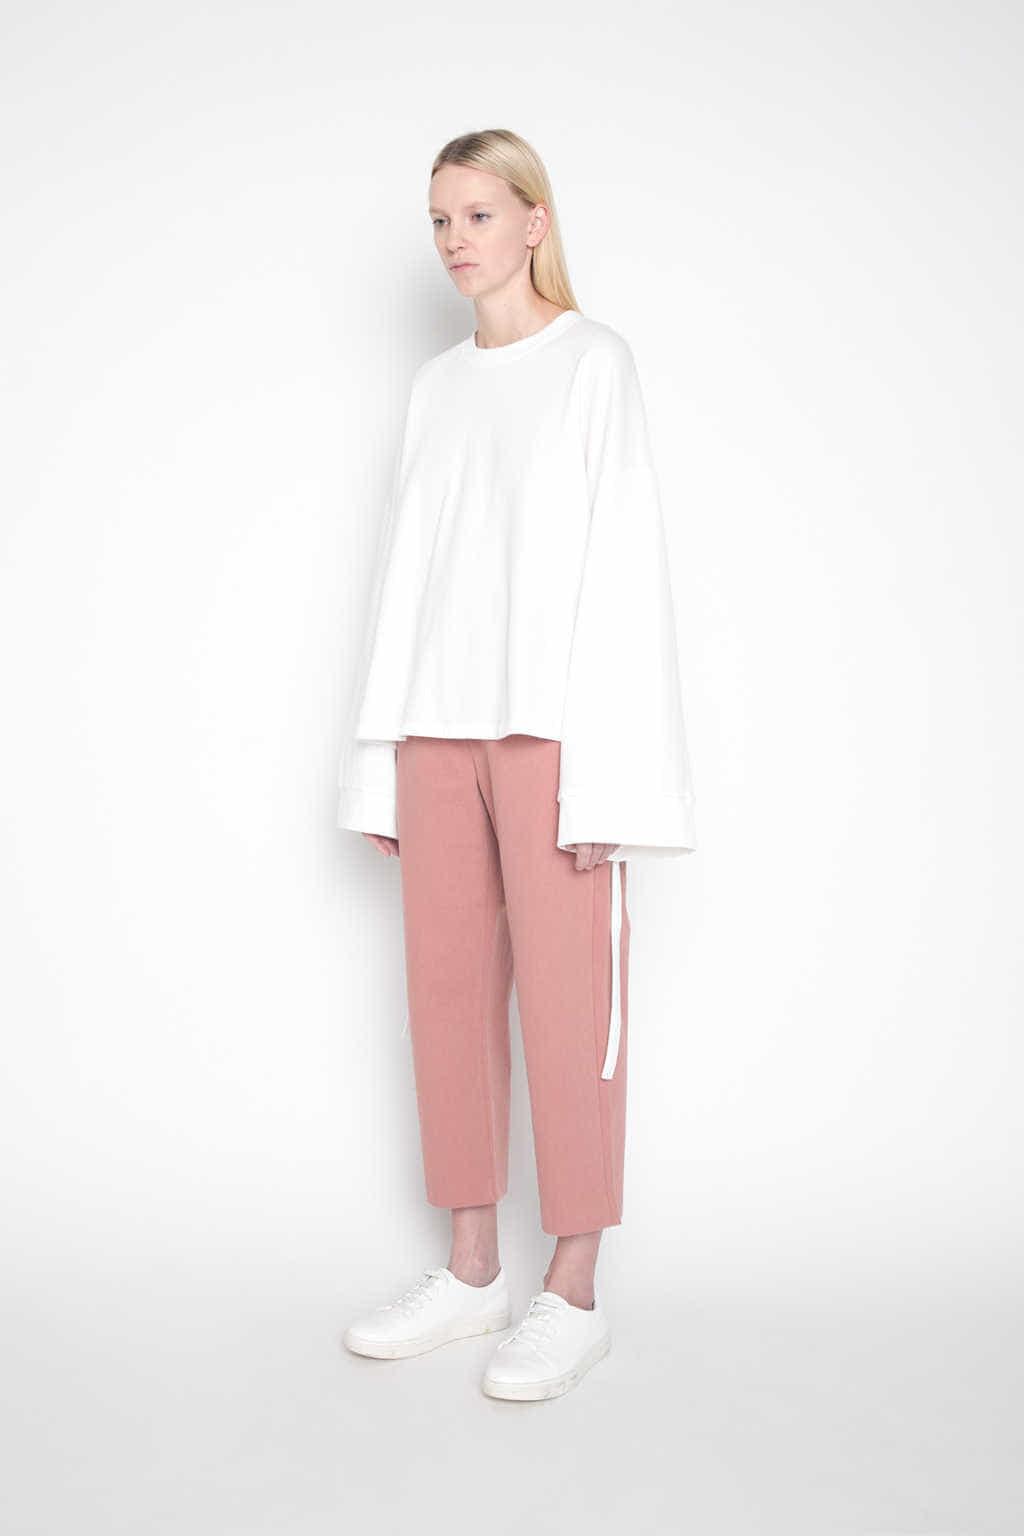 Sweater H010 Cream 1